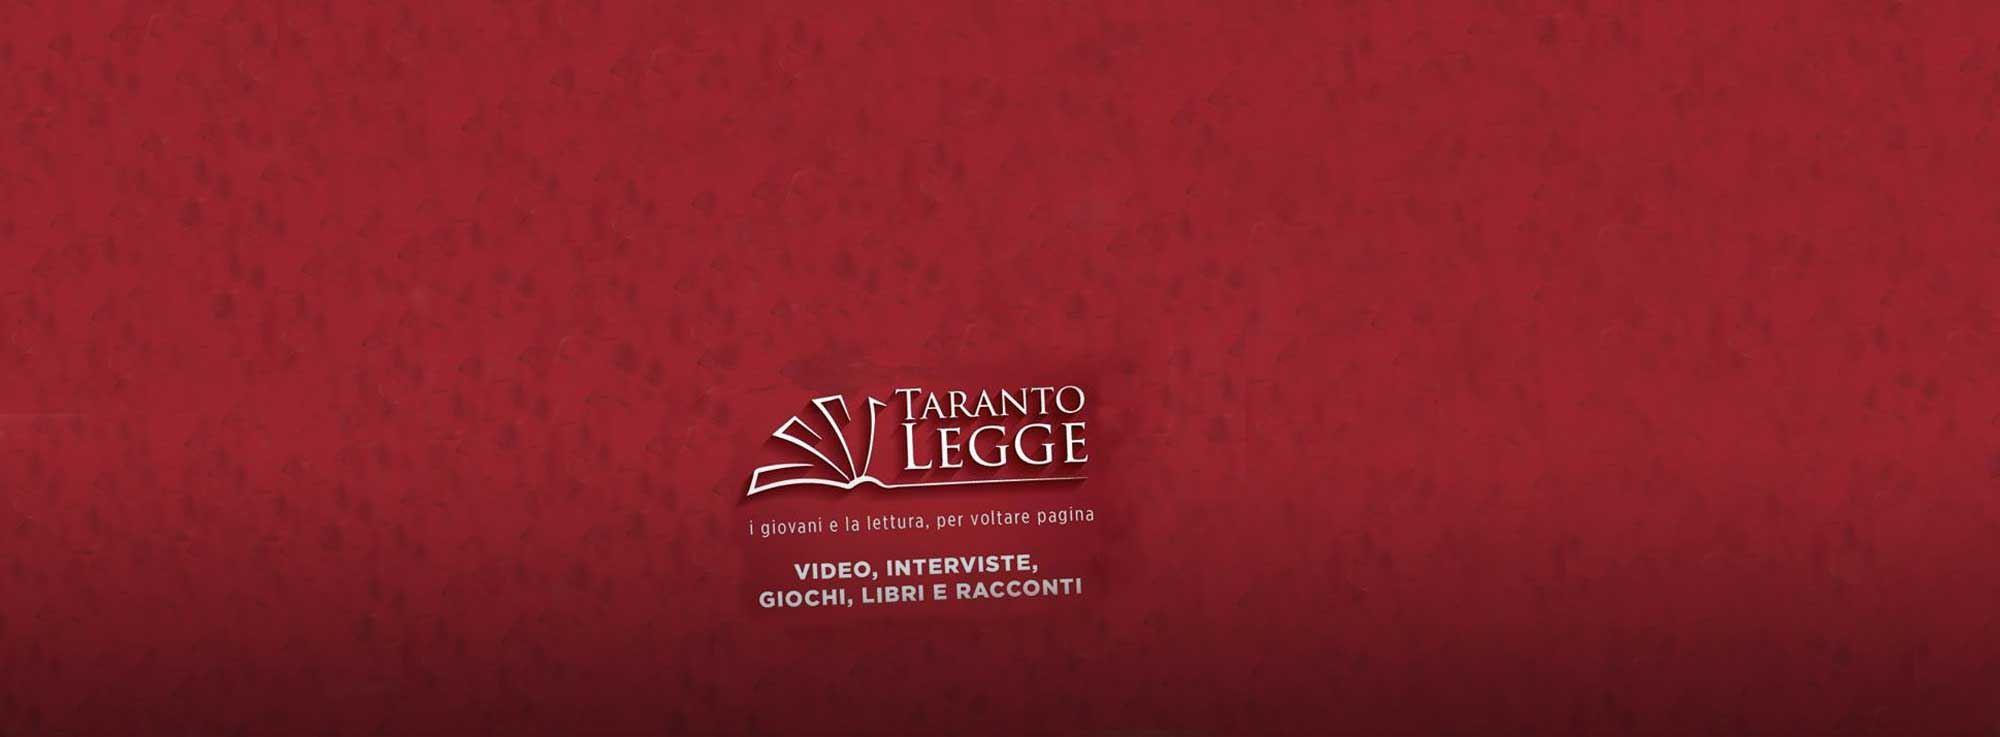 Taranto: Taranto Legge